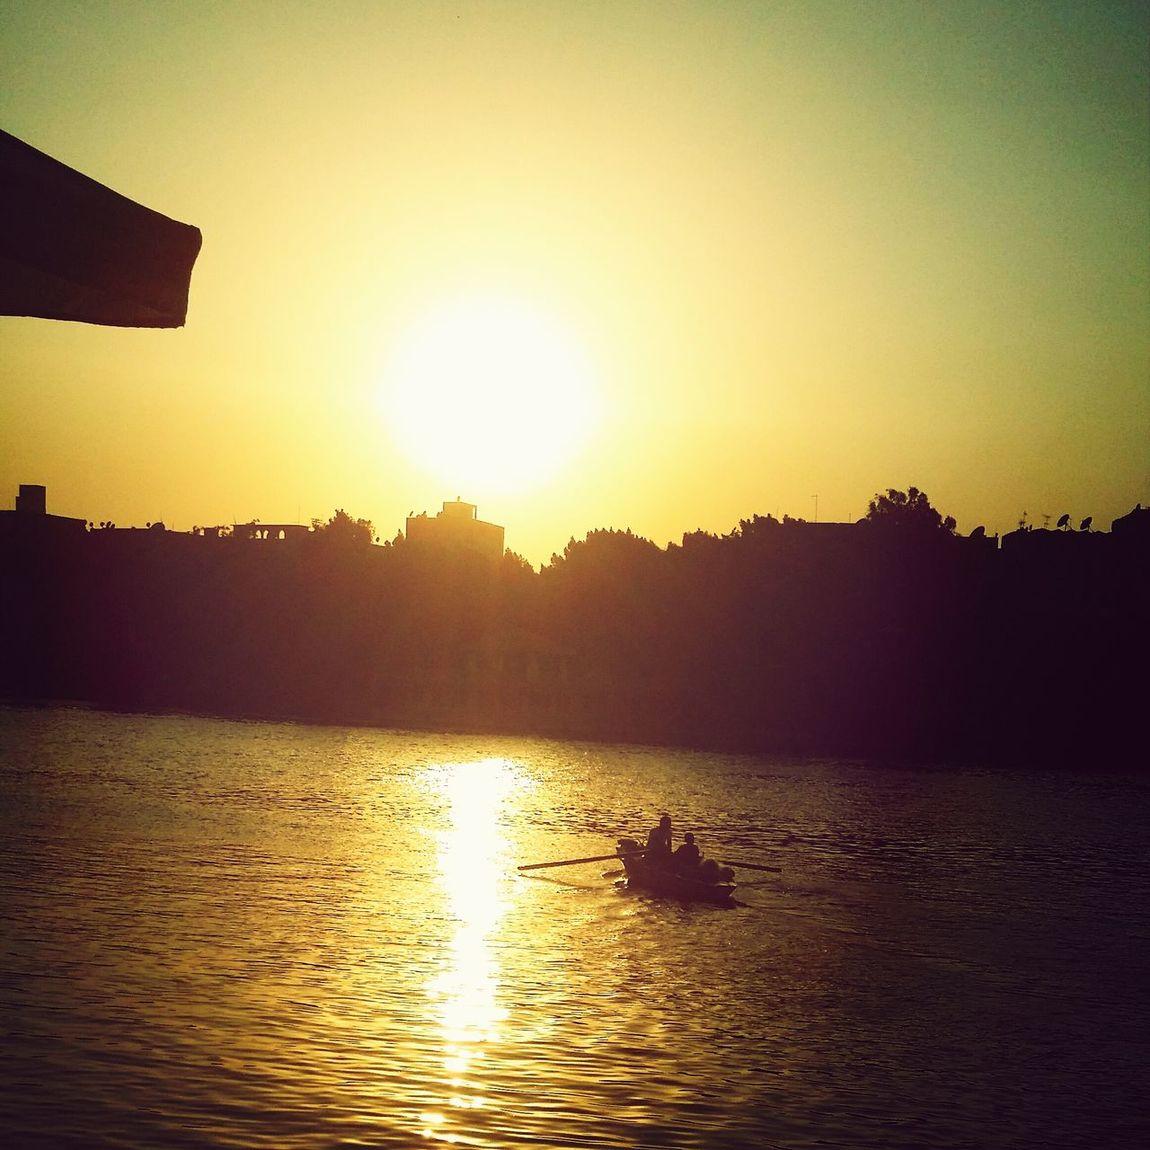 Nile Colors Of Life In Egypt Subhan'Allah Beutiful